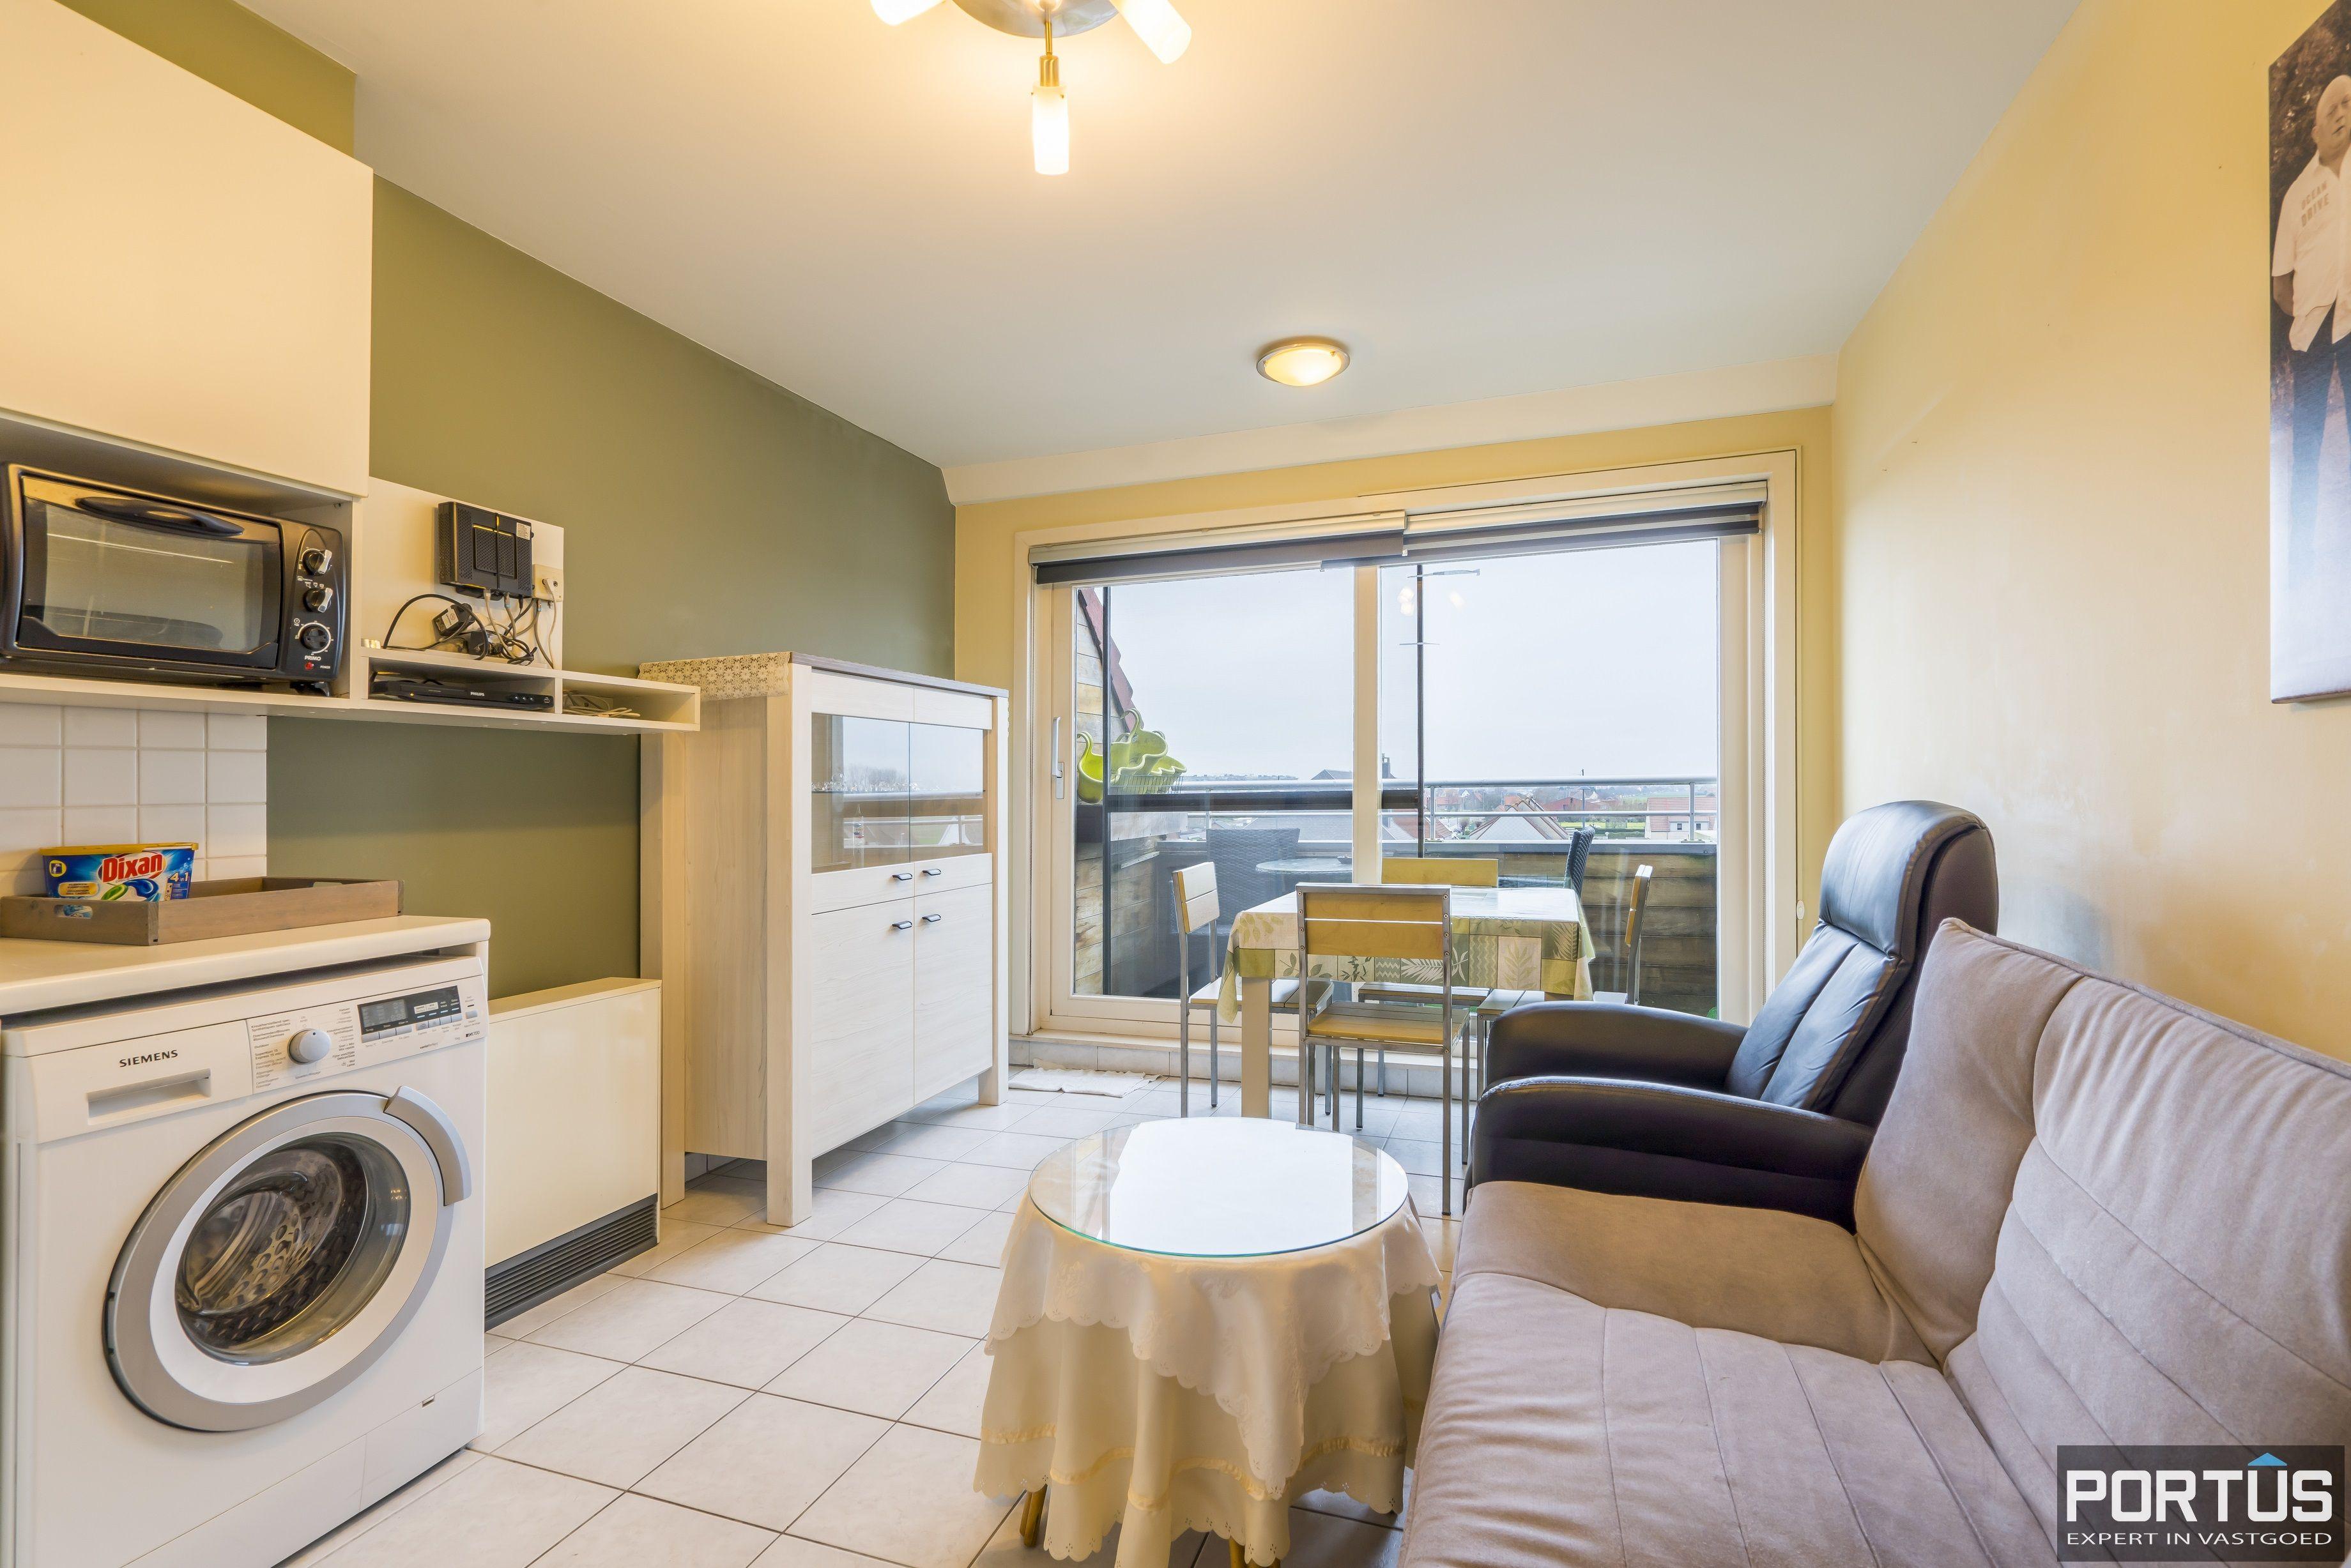 Instapklaar appartement met 1 slaapkamer te koop te Westende - 12054